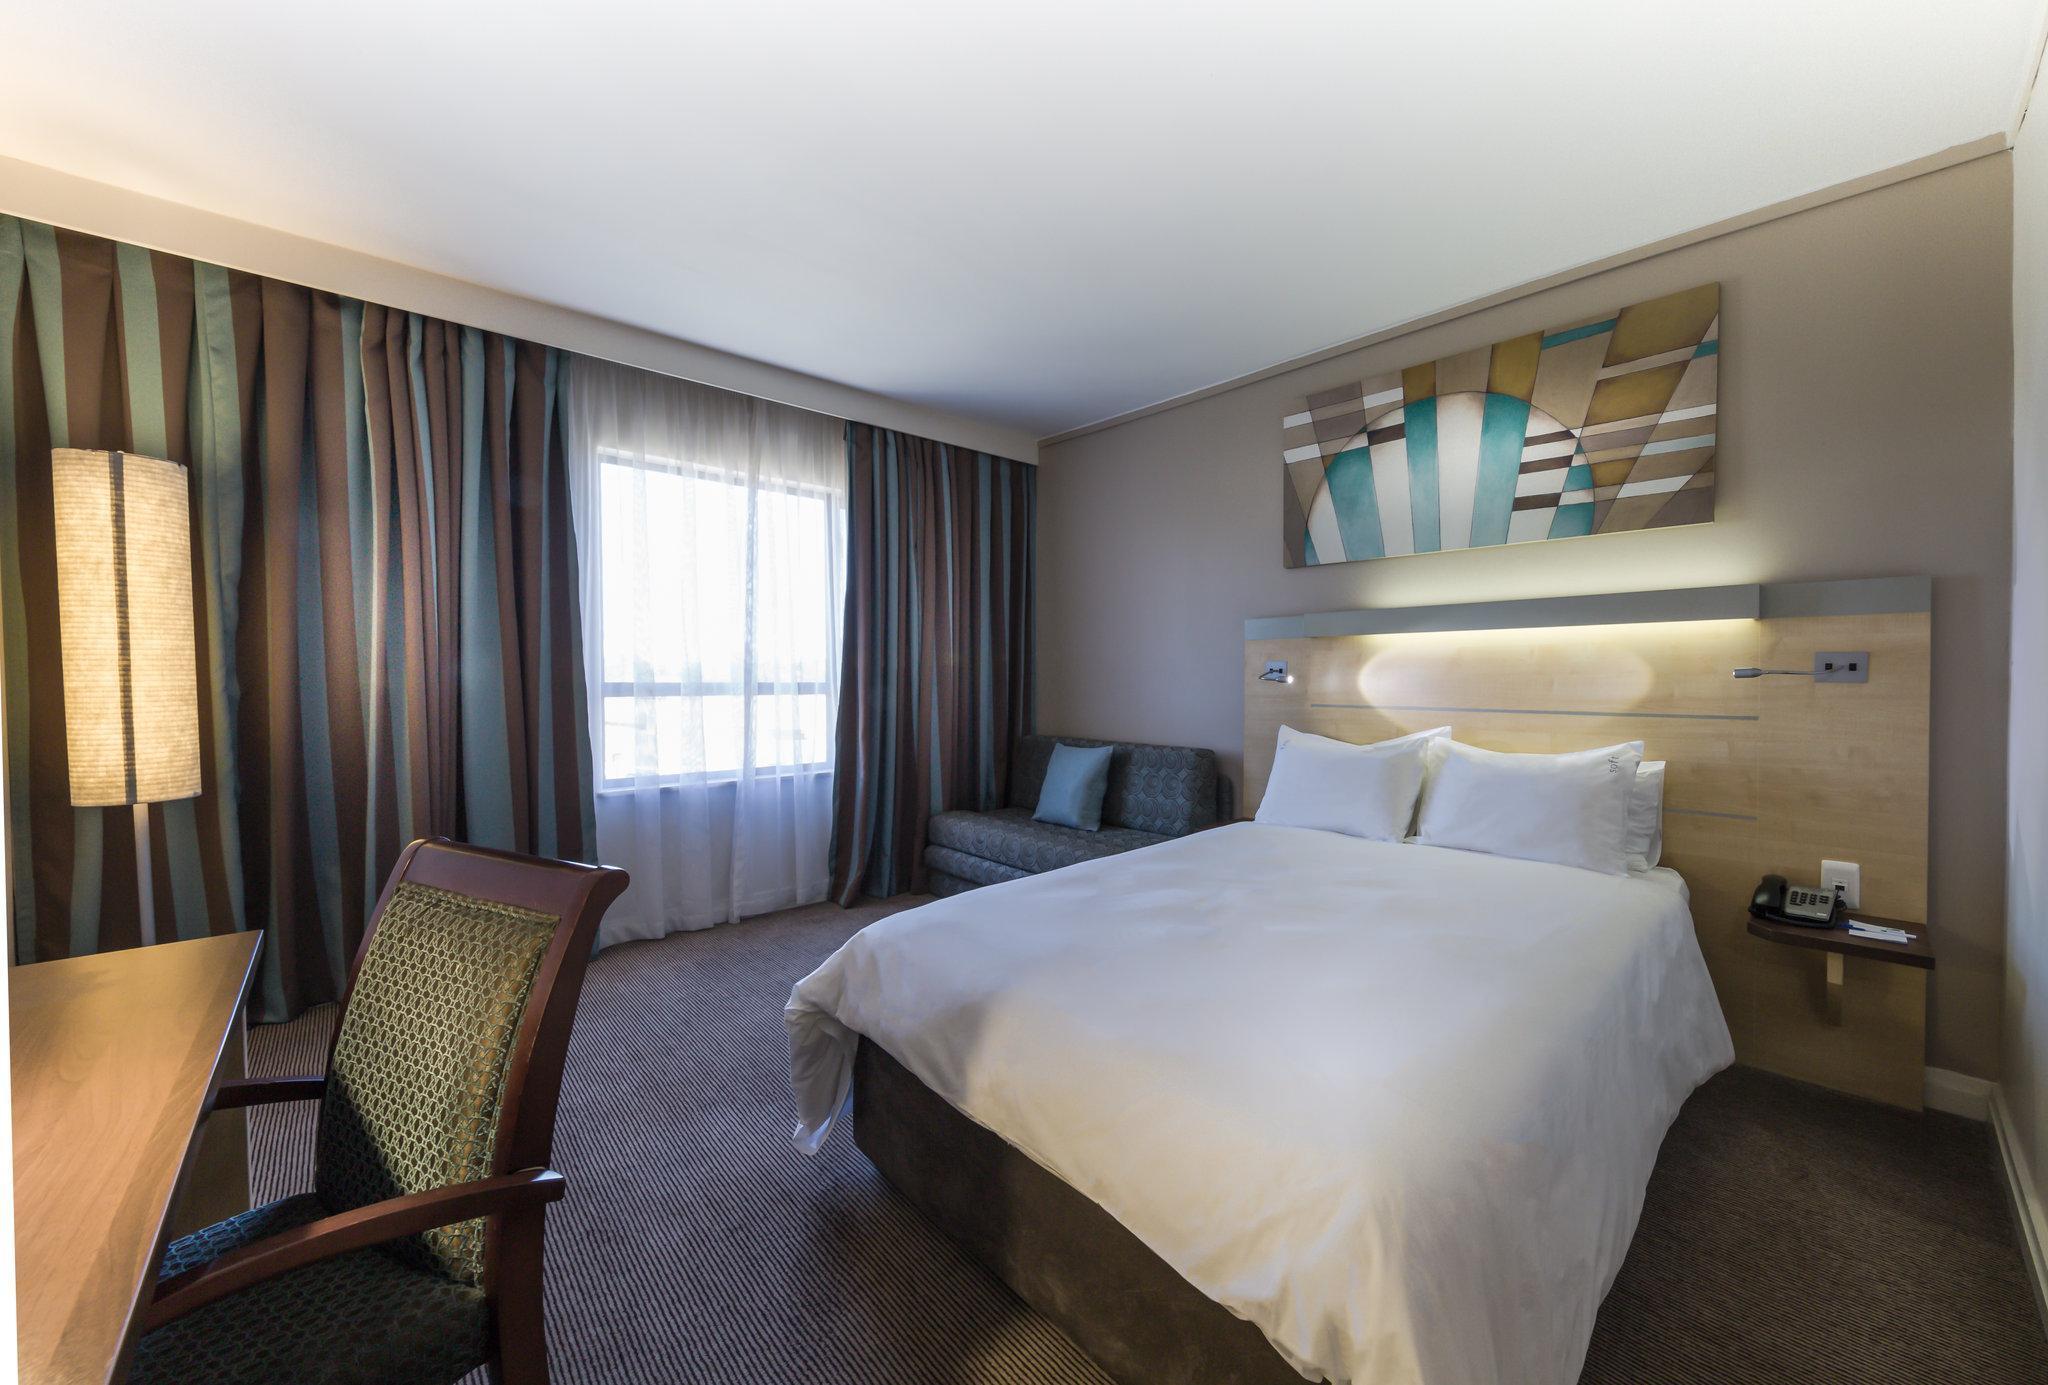 Holiday Inn Express Sandton Woodmead, City of Johannesburg